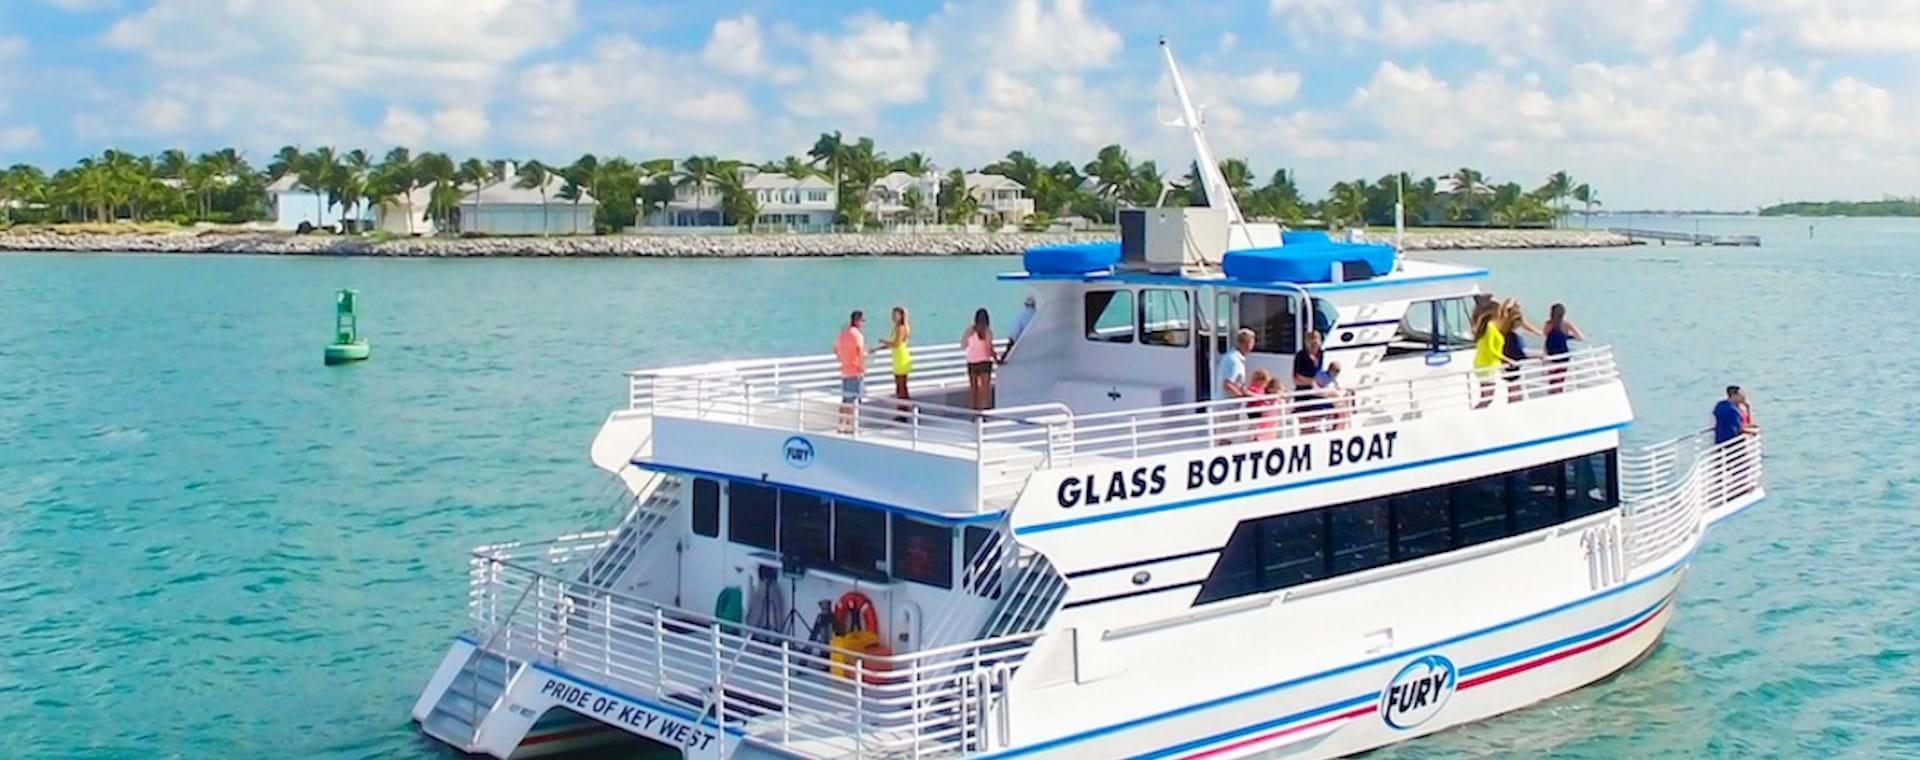 Cruise in the Ocean near Key West